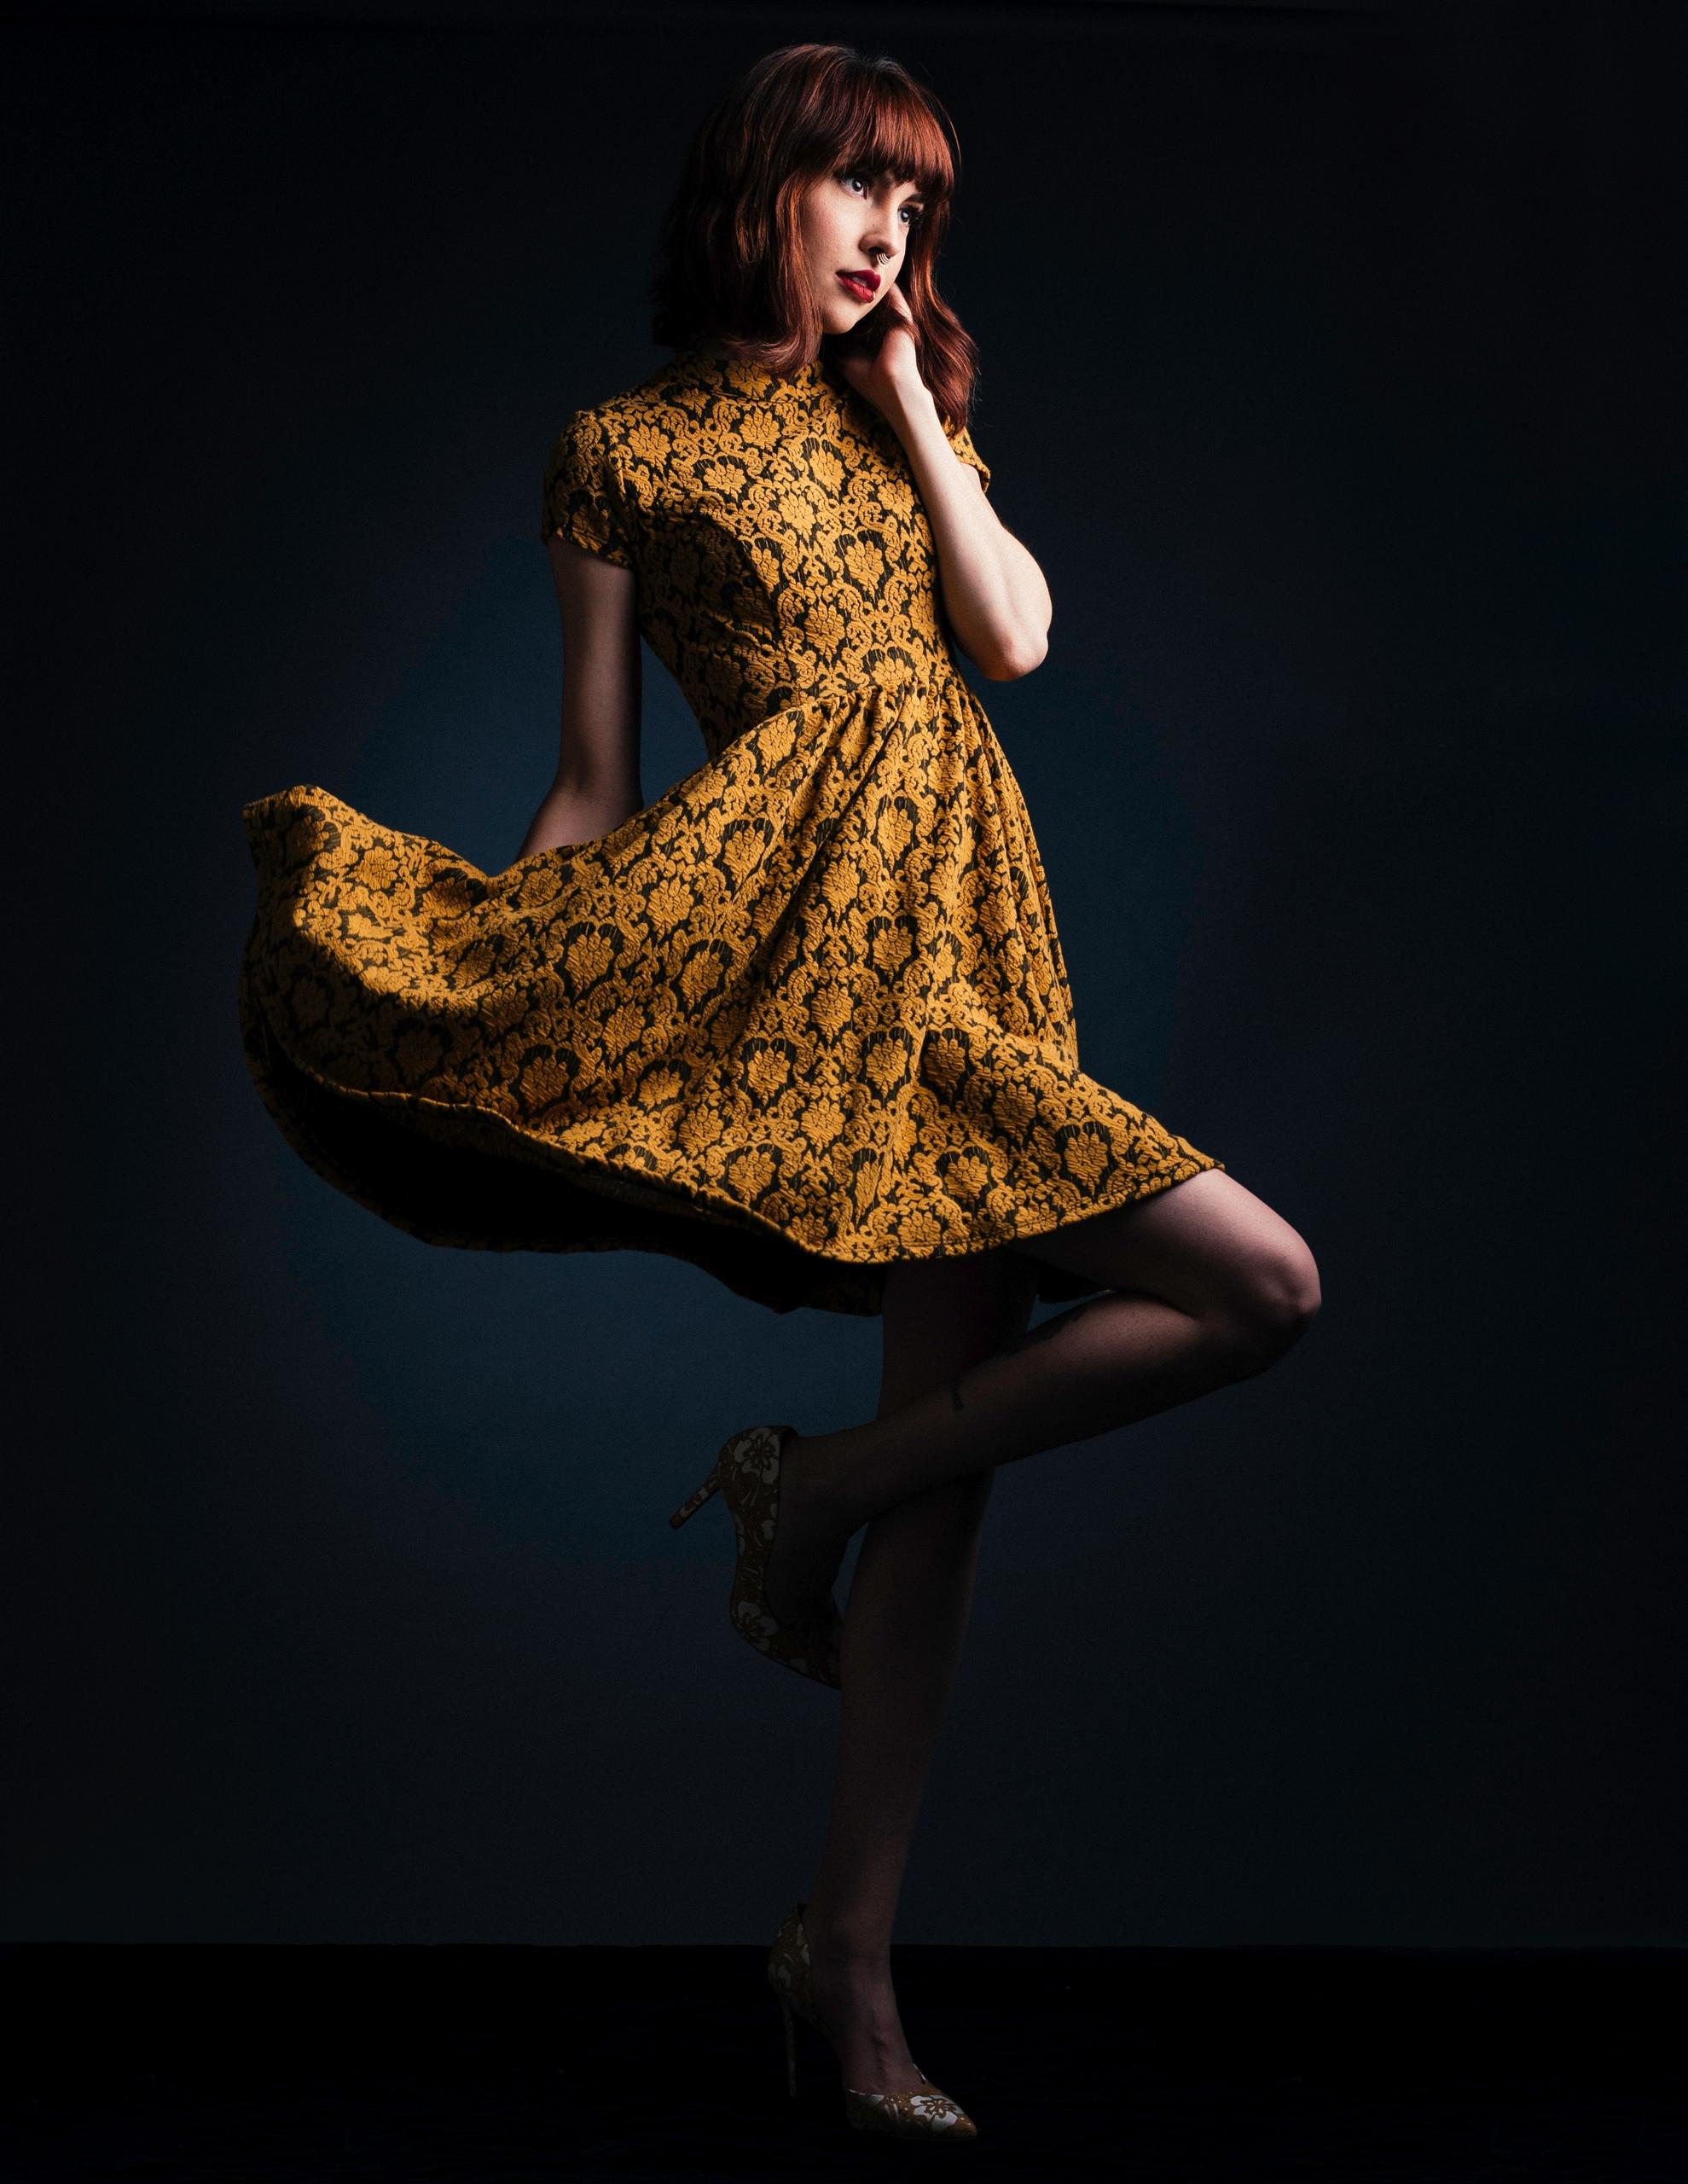 Model: Brittany MTM Model Manag - mdanielsphotography | ello